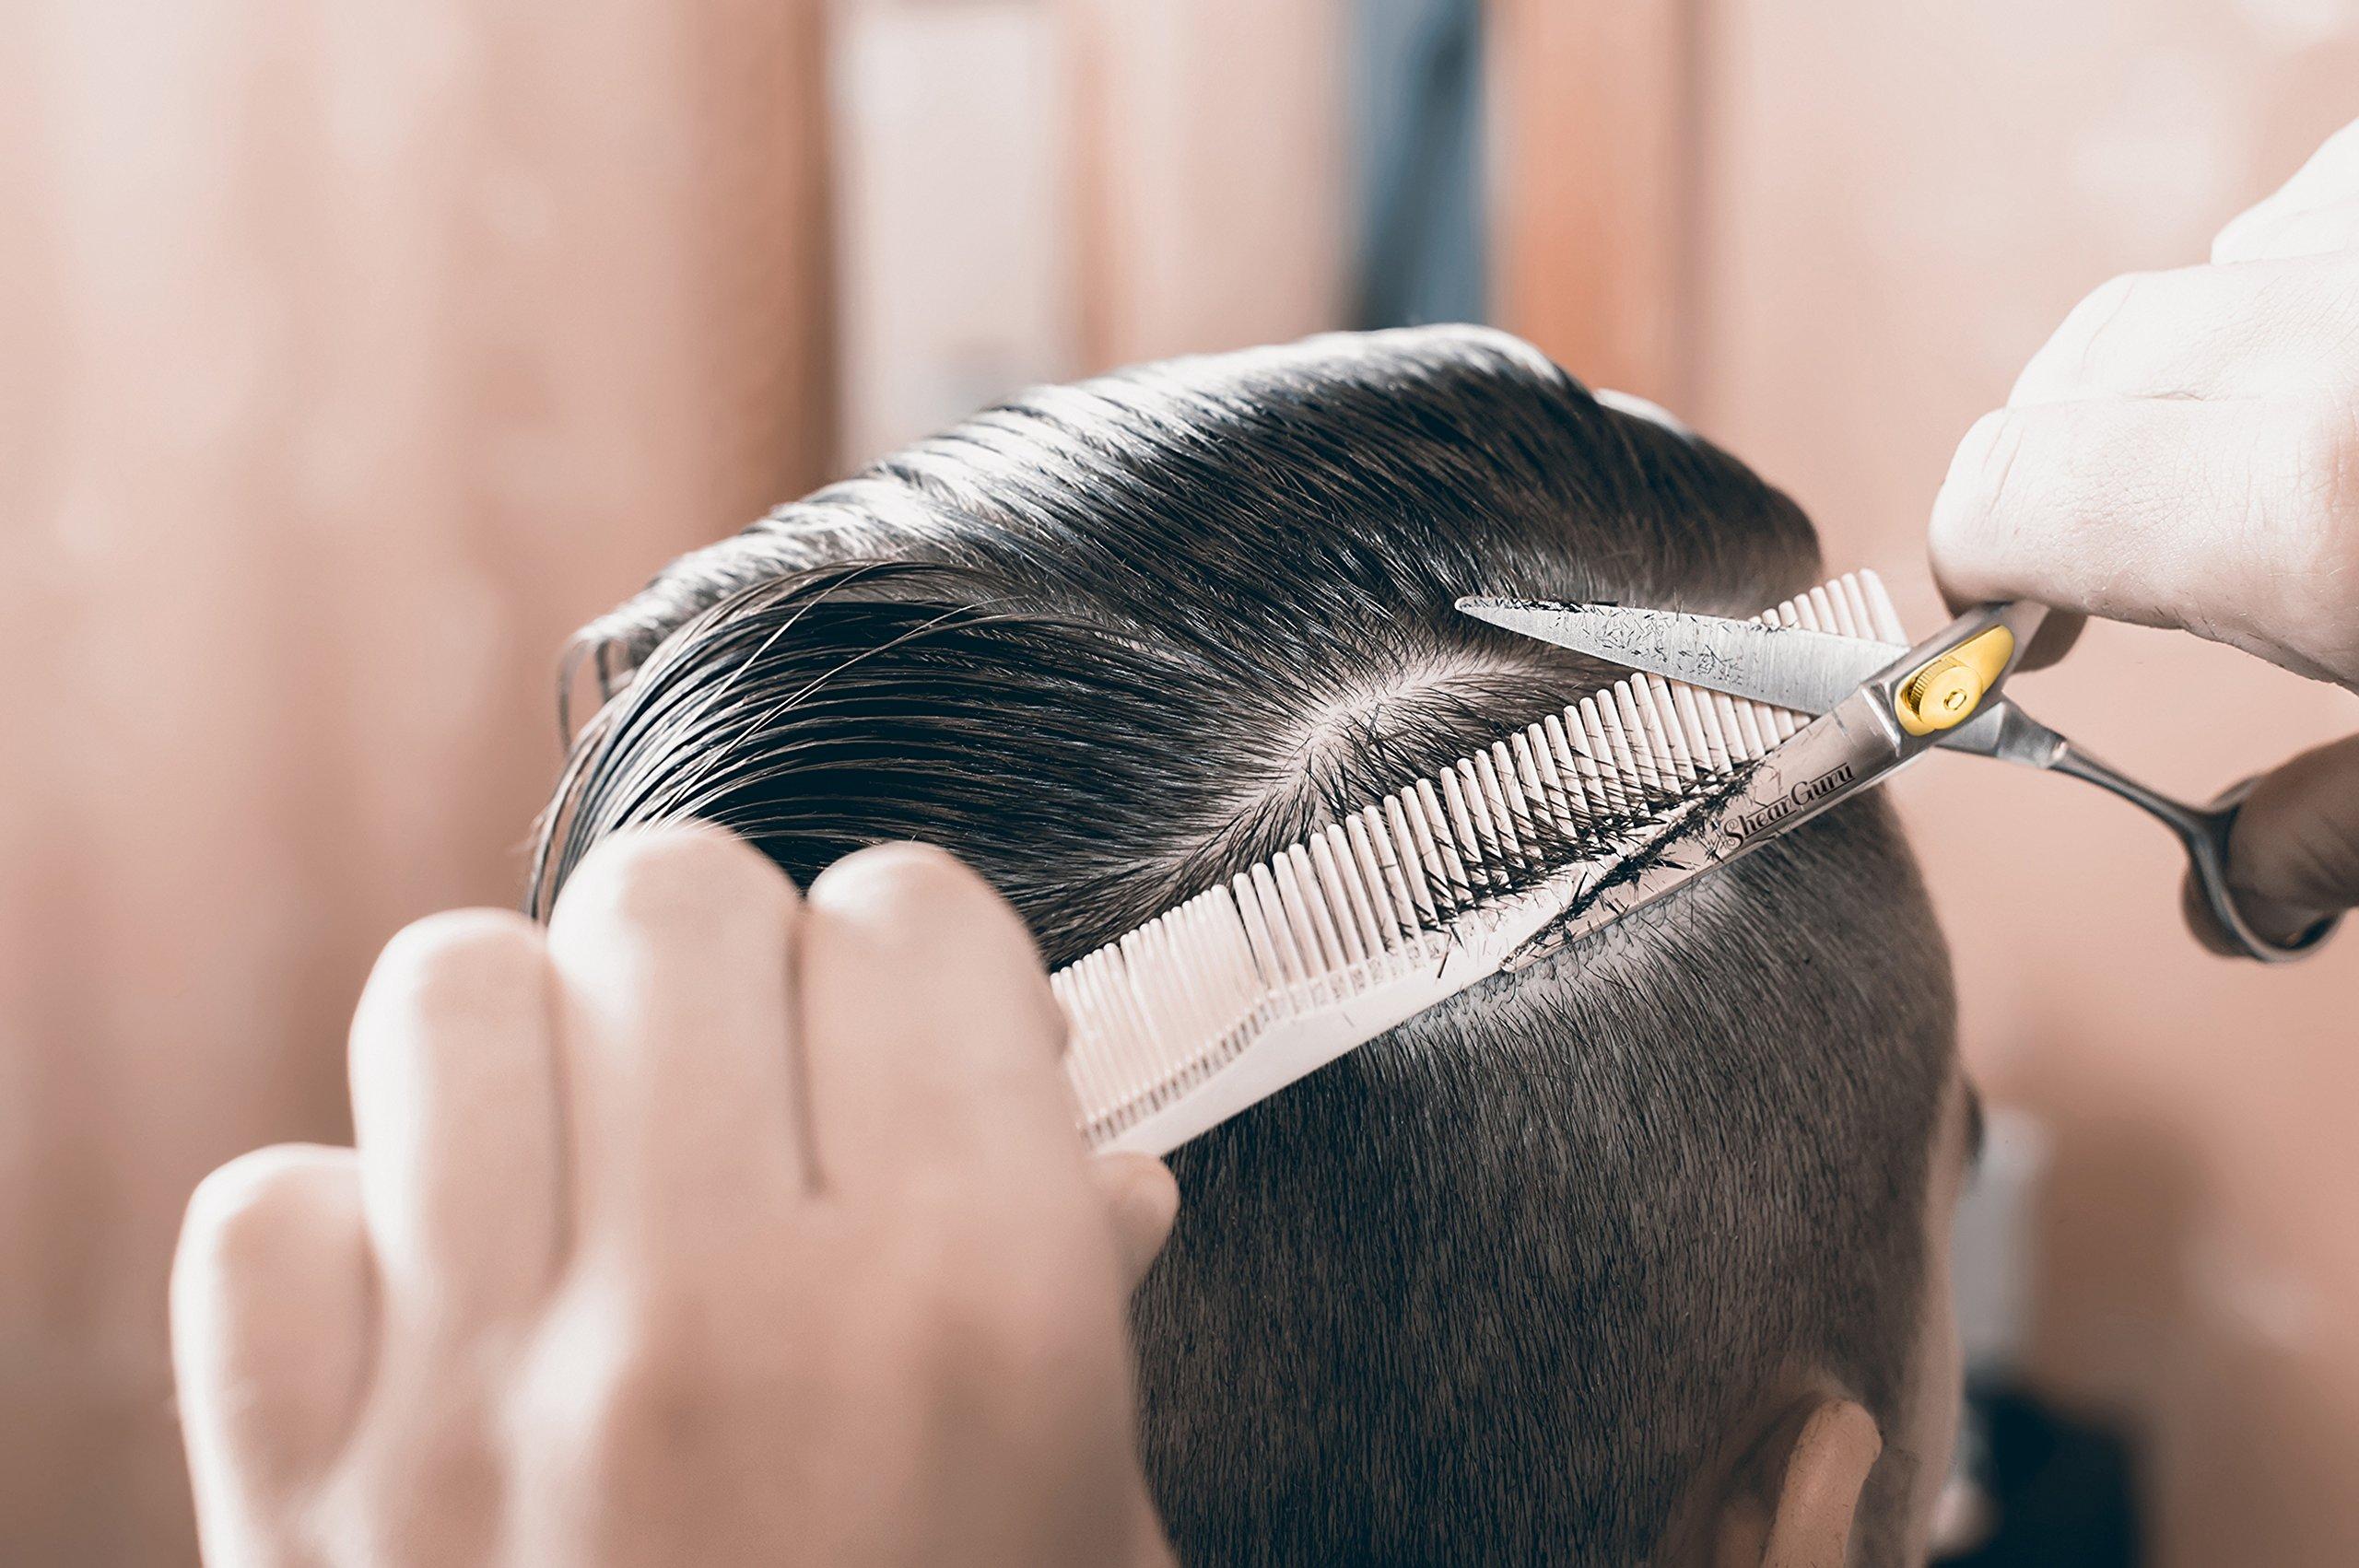 Professional Barber Scissor Hair Cutting Set - 6.5'' - 1 Straight Edge Hair Scissor, 1 Texturizing Thinning Shears, Plus Bonus Faux Leather Case - By ShearGuru … by ShearGuru (Image #6)